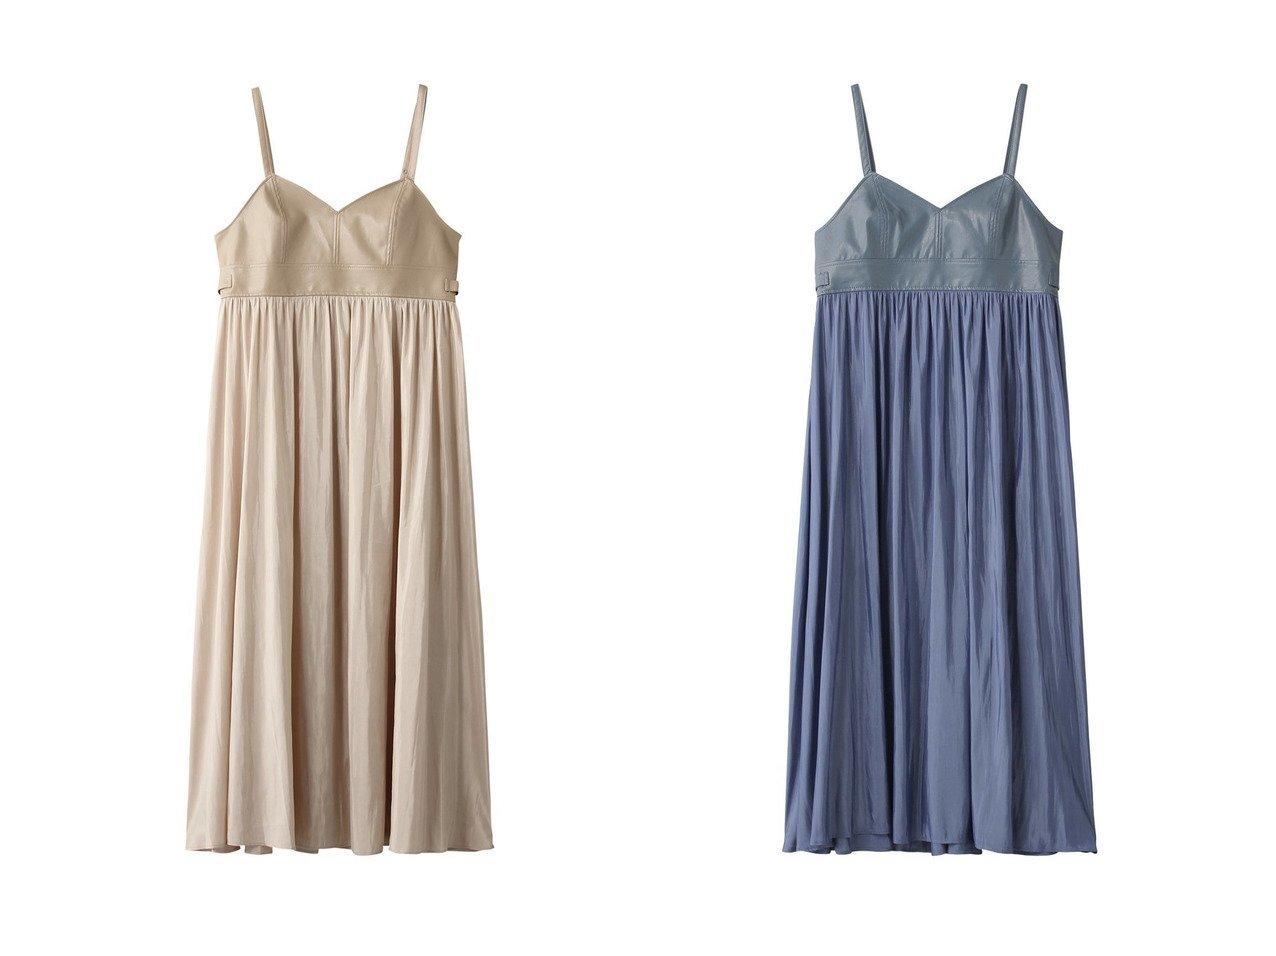 【ROSE BUD/ローズバッド】のフェイクレザーキャミワンピース ワンピース・ドレスのおすすめ!人気、トレンド・レディースファッションの通販 おすすめで人気の流行・トレンド、ファッションの通販商品 メンズファッション・キッズファッション・インテリア・家具・レディースファッション・服の通販 founy(ファニー) https://founy.com/ ファッション Fashion レディースファッション WOMEN ワンピース Dress キャミワンピース No Sleeve Dresses 2021年 2021 2021 春夏 S/S SS Spring/Summer 2021 S/S 春夏 SS Spring/Summer カットソー キャミソール キャミワンピース ギャザー ビスチェ 春 Spring |ID:crp329100000024806